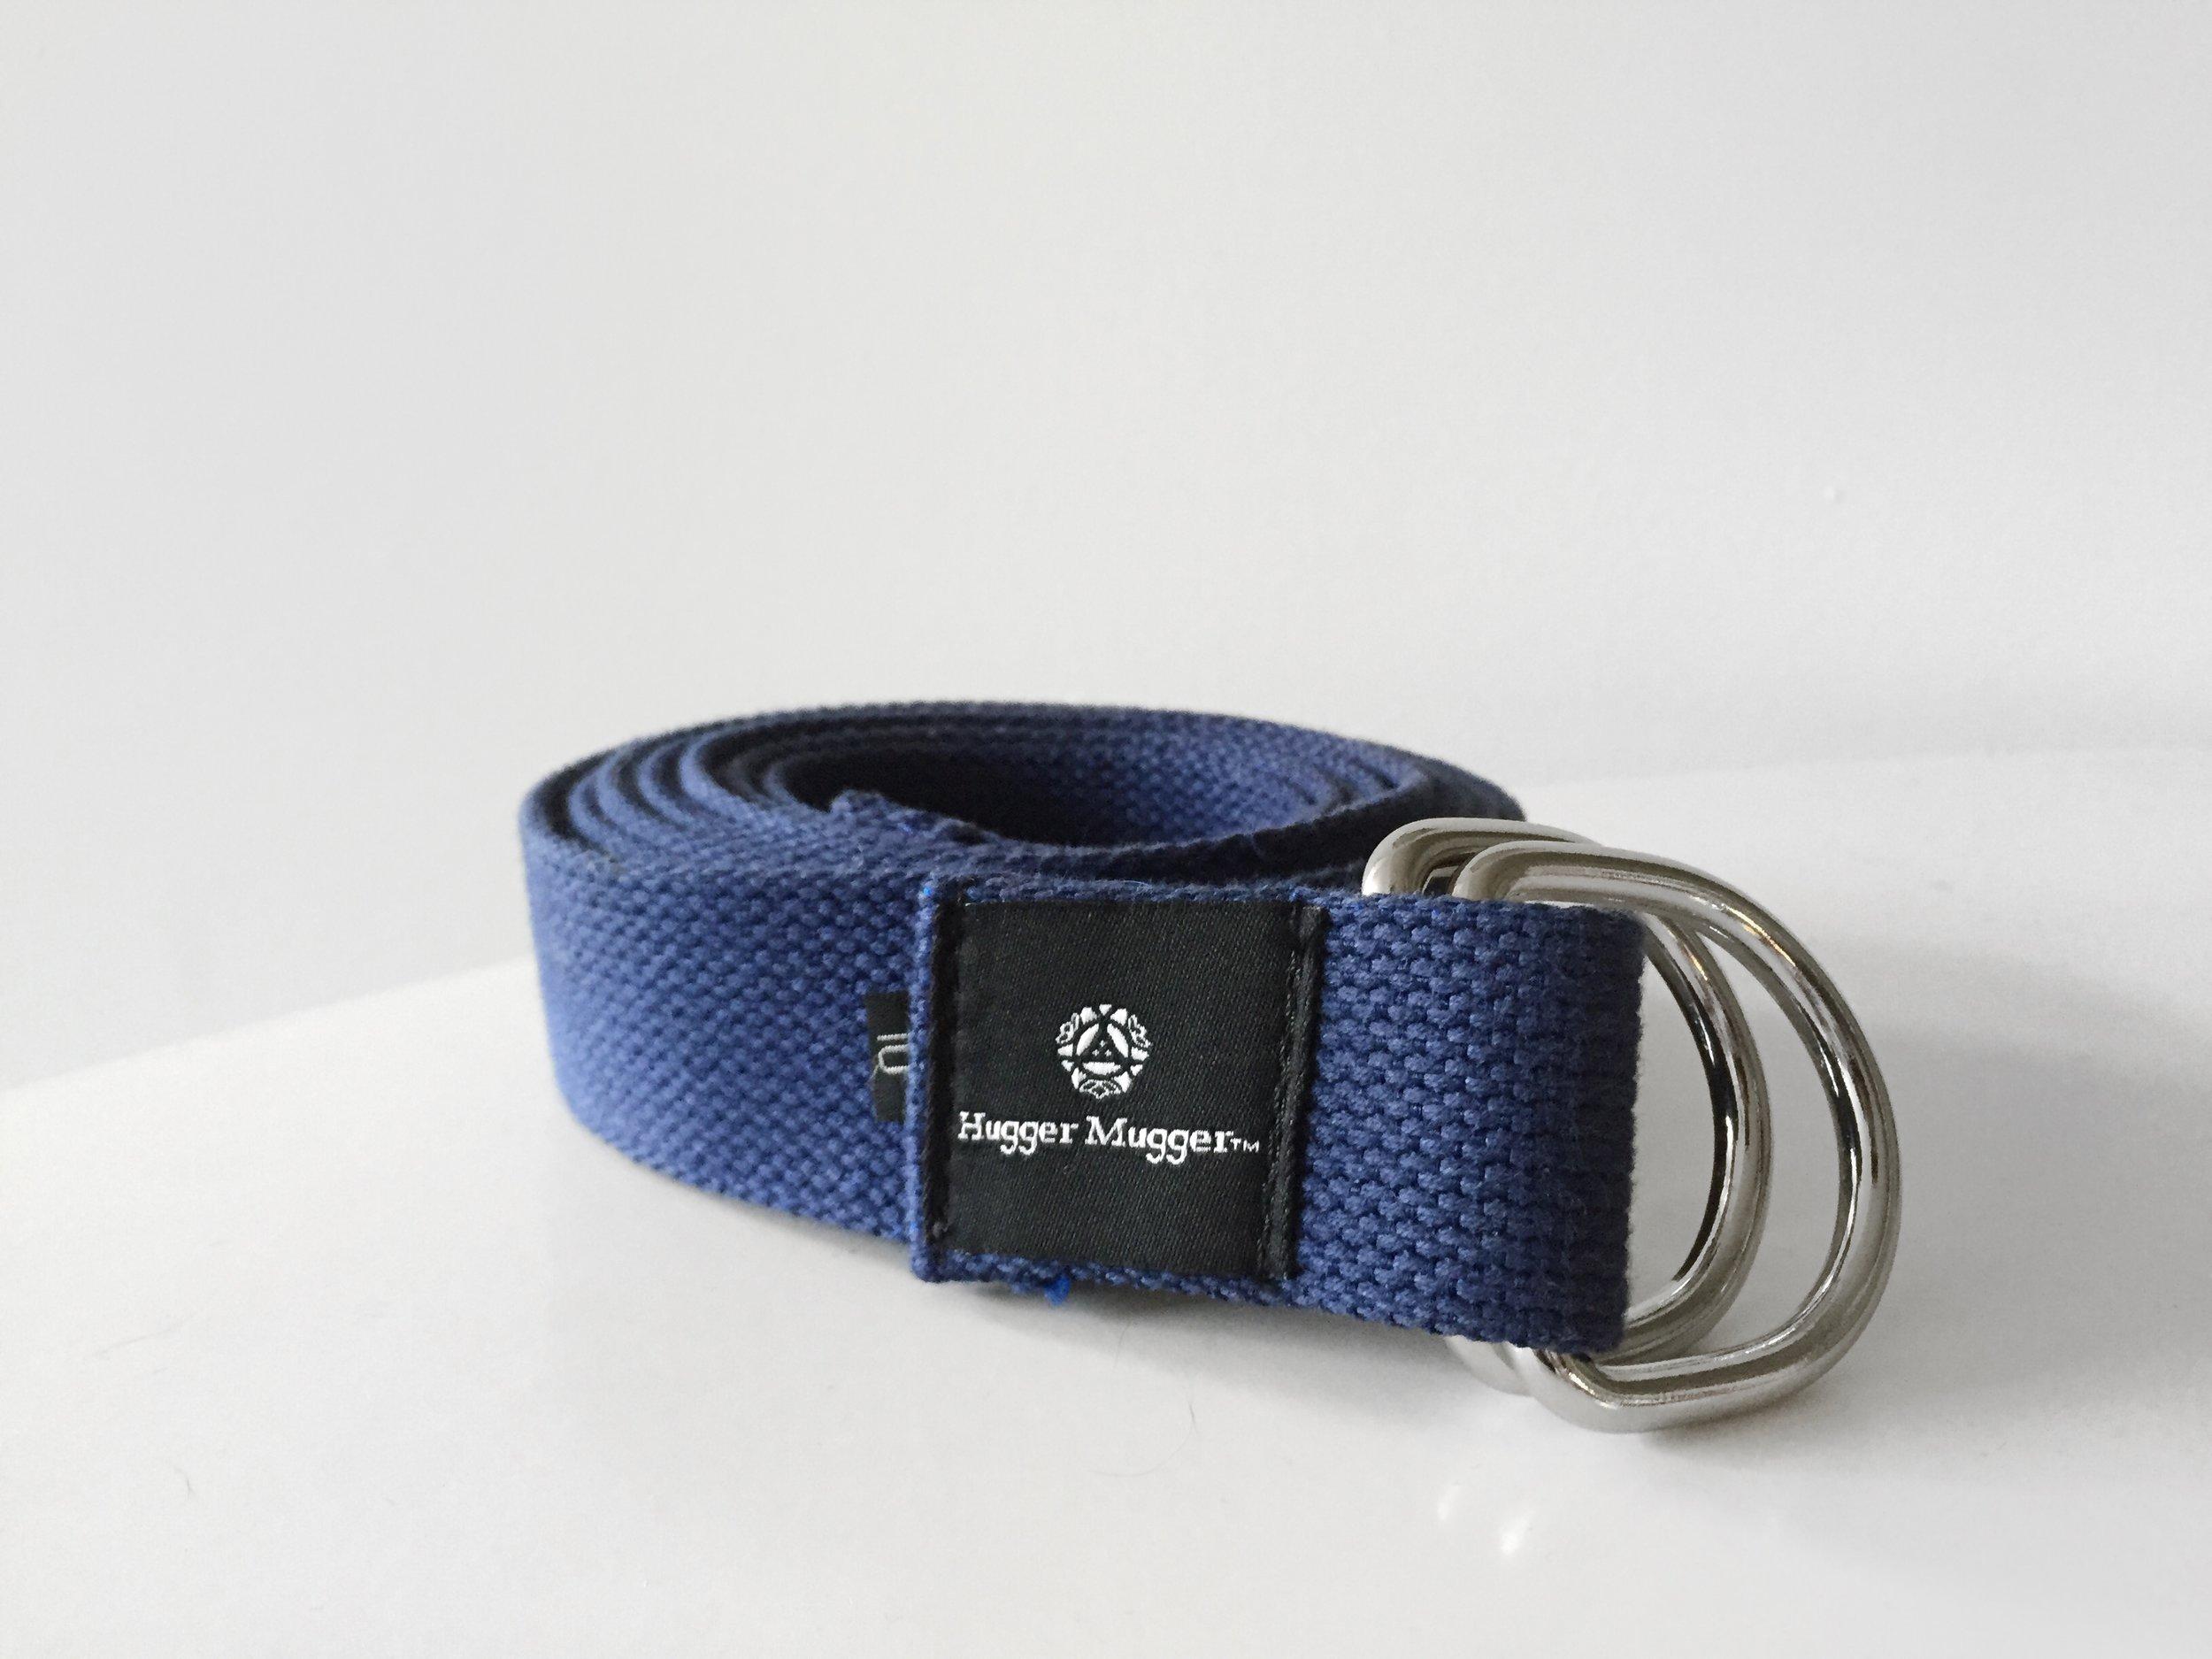 d-ring strap